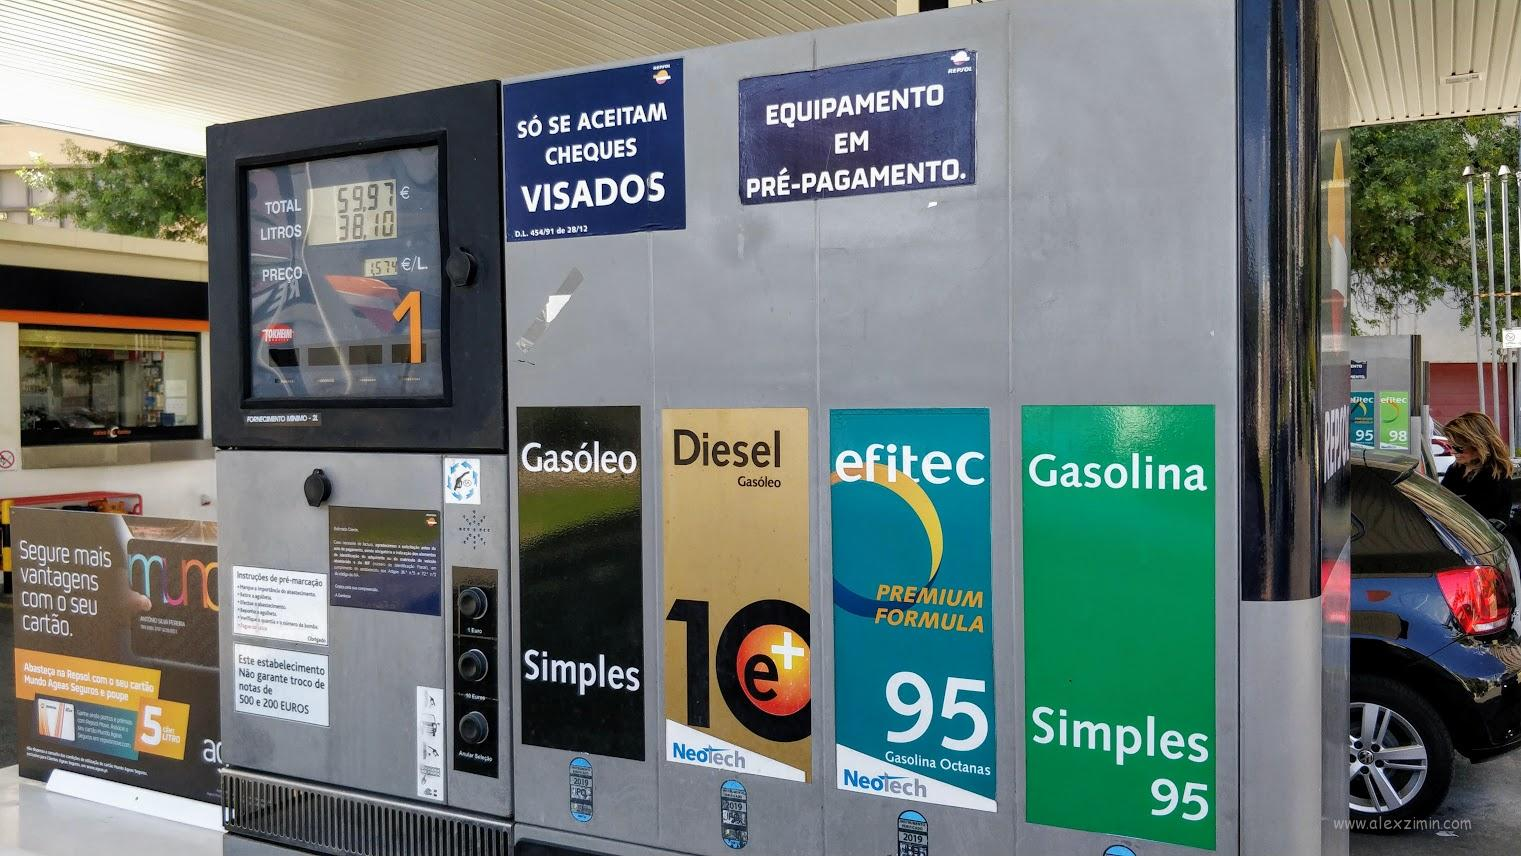 Заправки в Португалии. Типы топлива